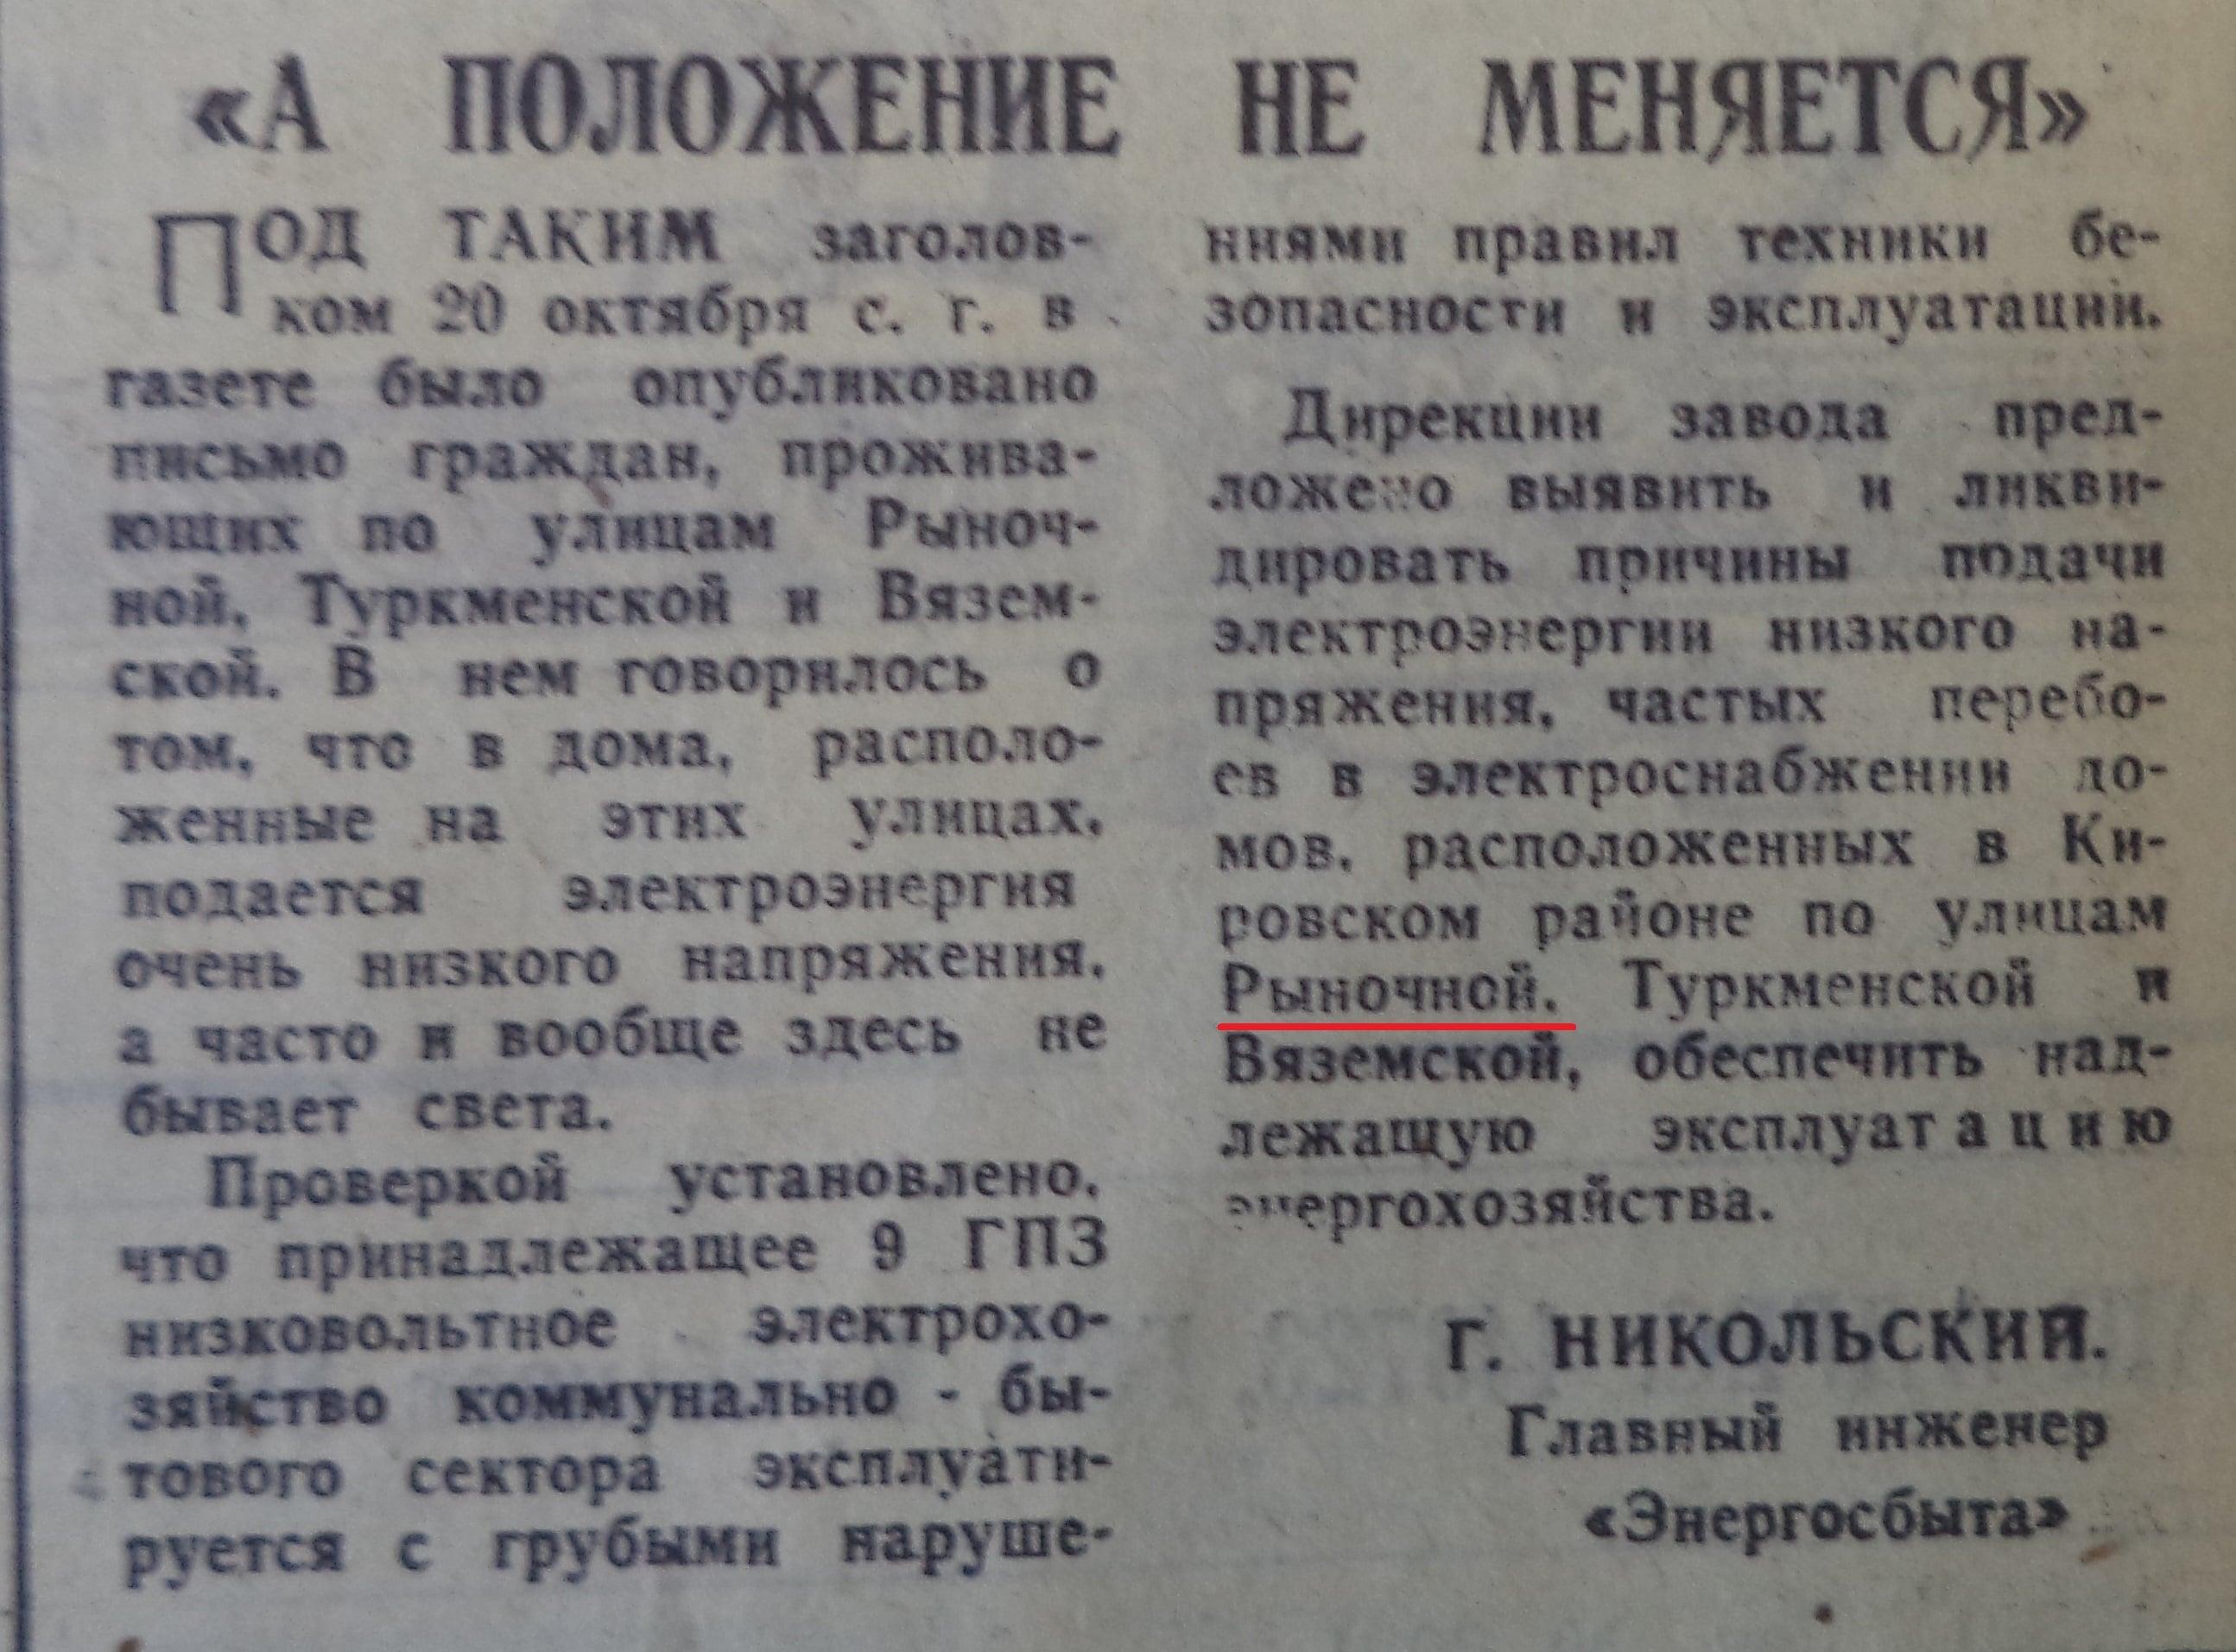 Рыночная-ФОТО-12-ВЗя-1971-11-04-проблемы ул. Туркмен.-min